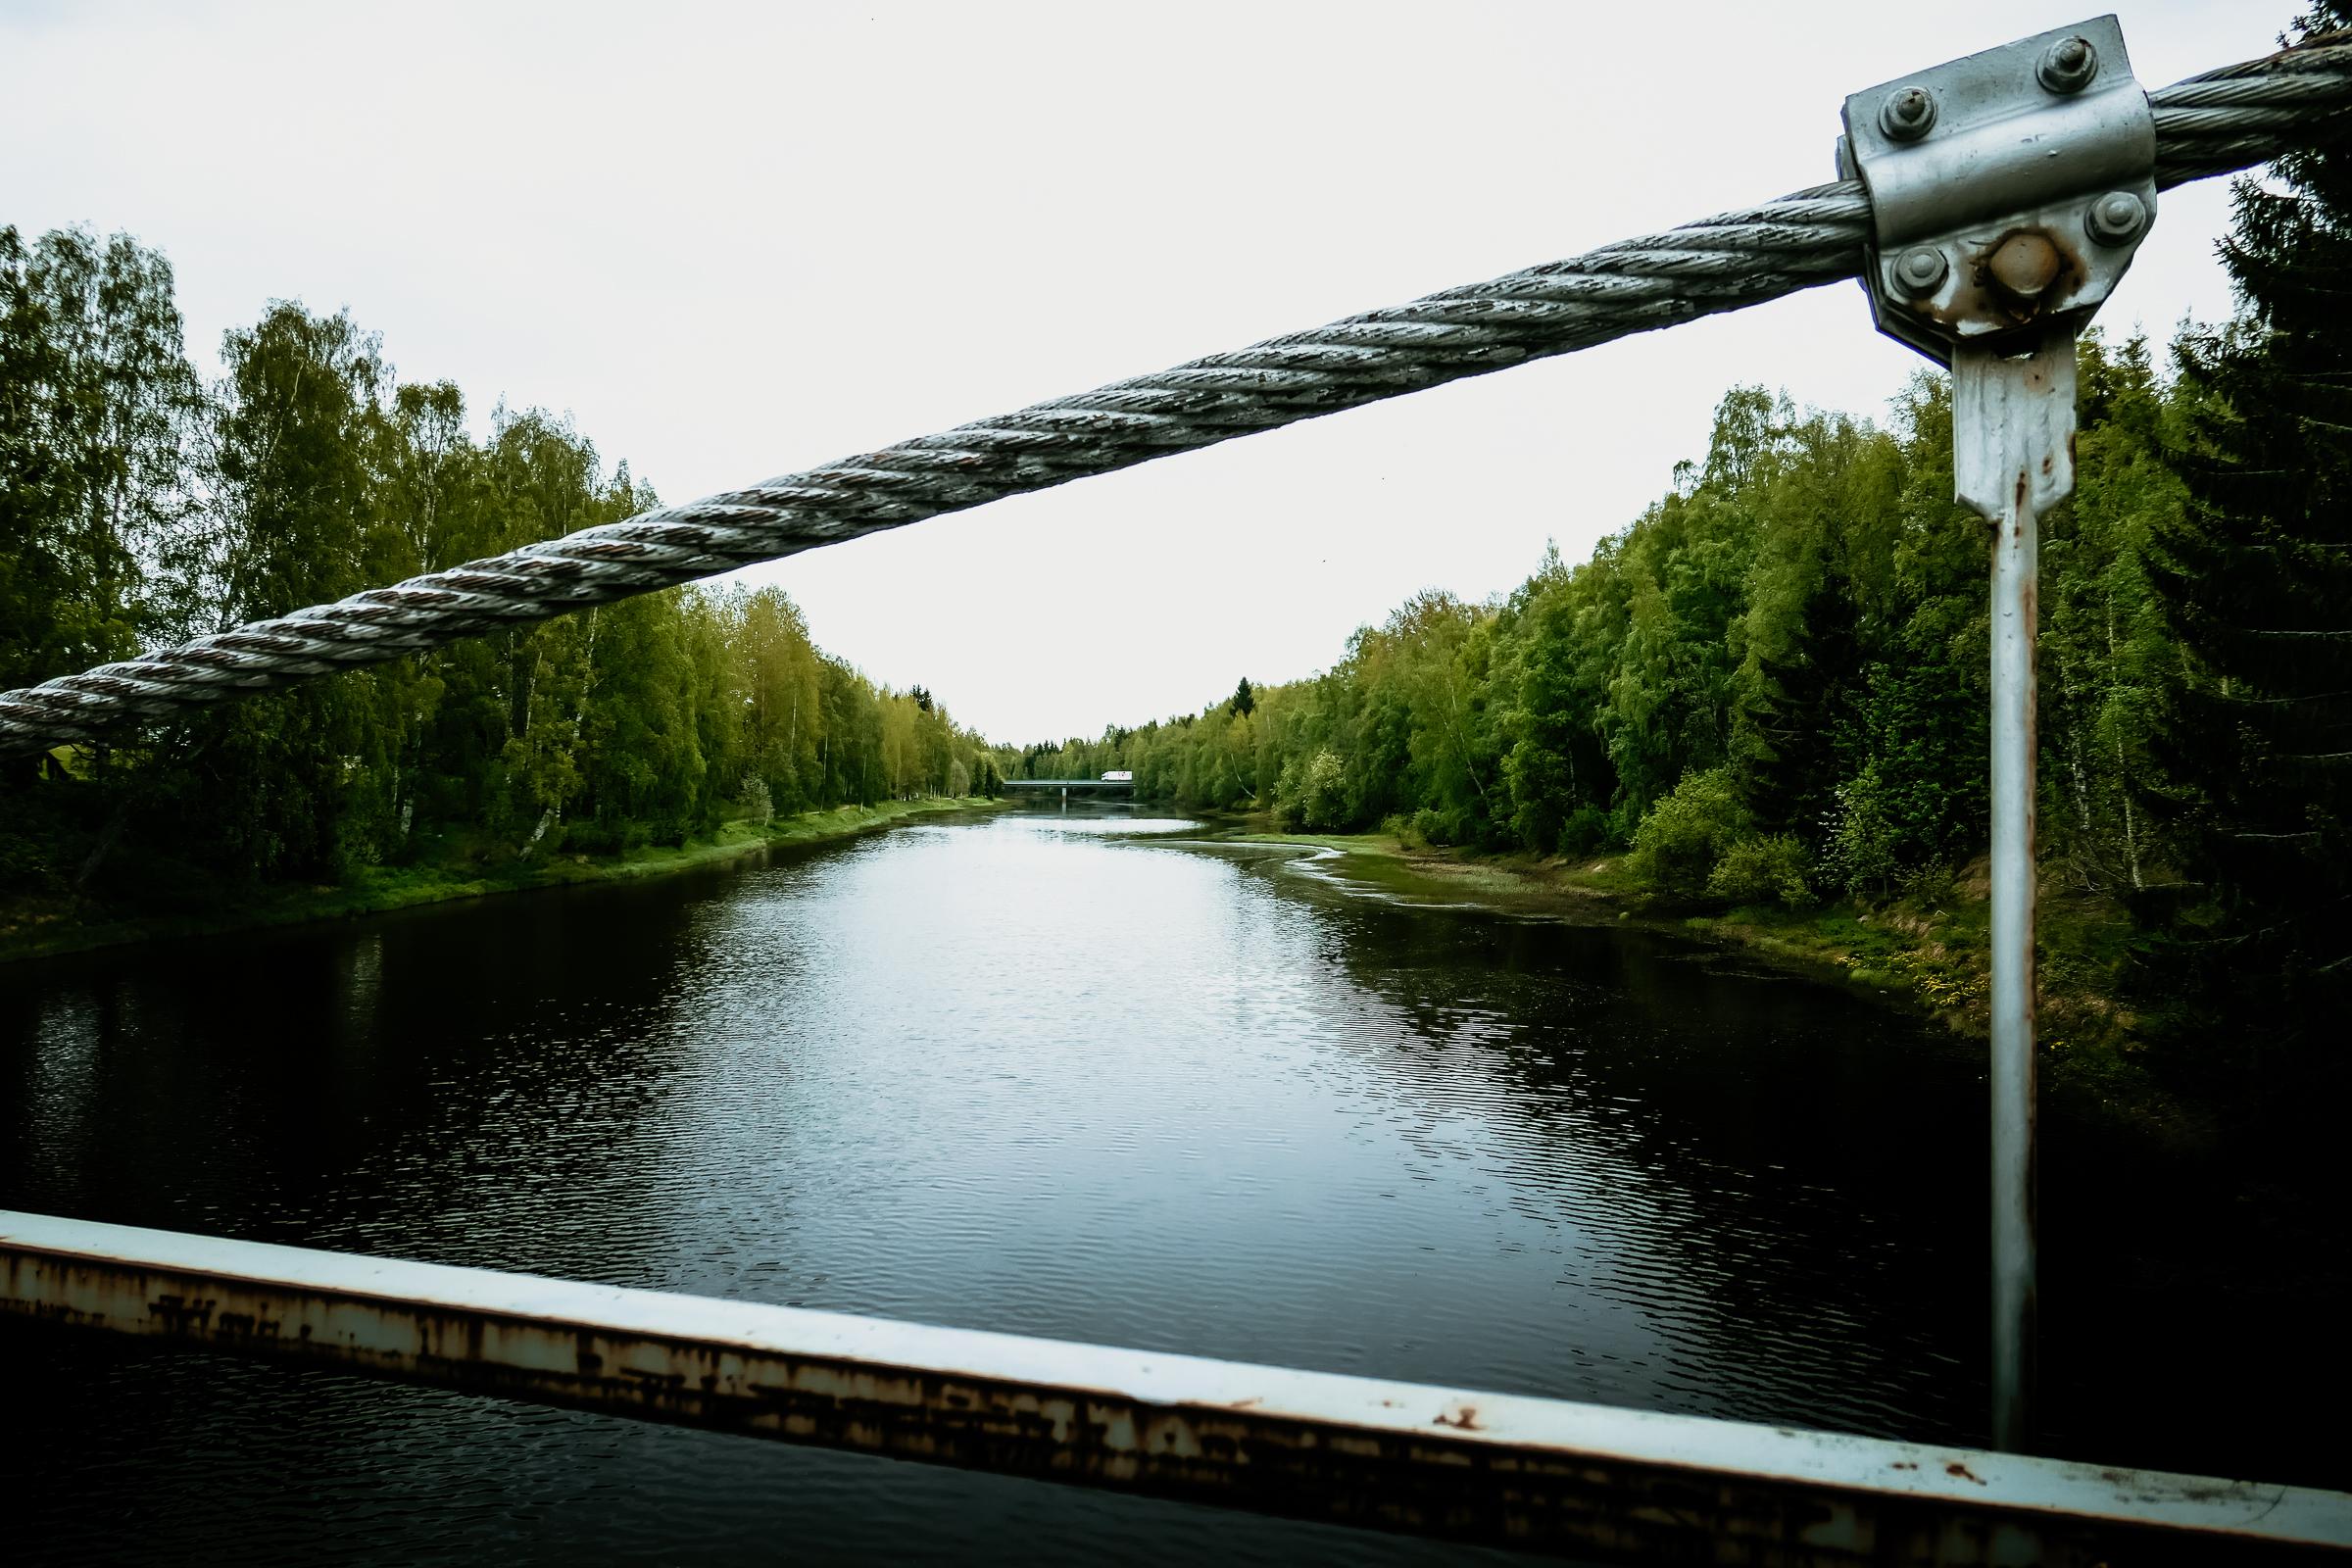 Somewhere in Oulu?